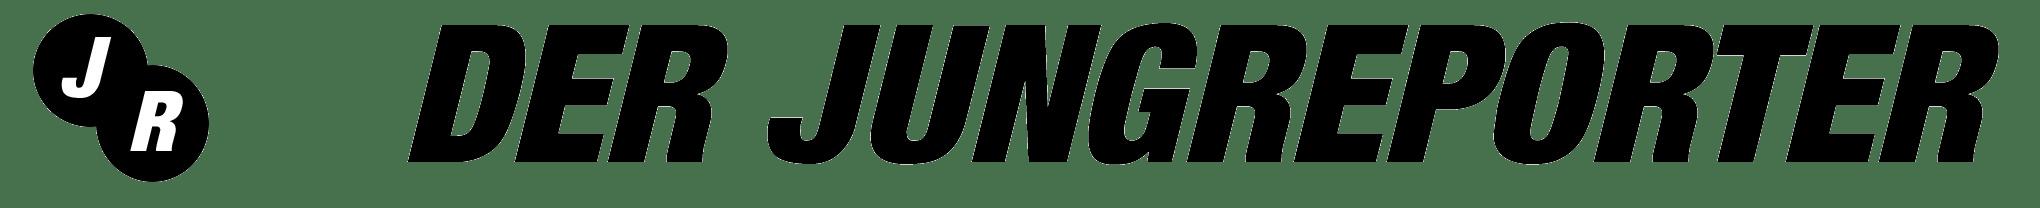 Der Jungreporter Logo